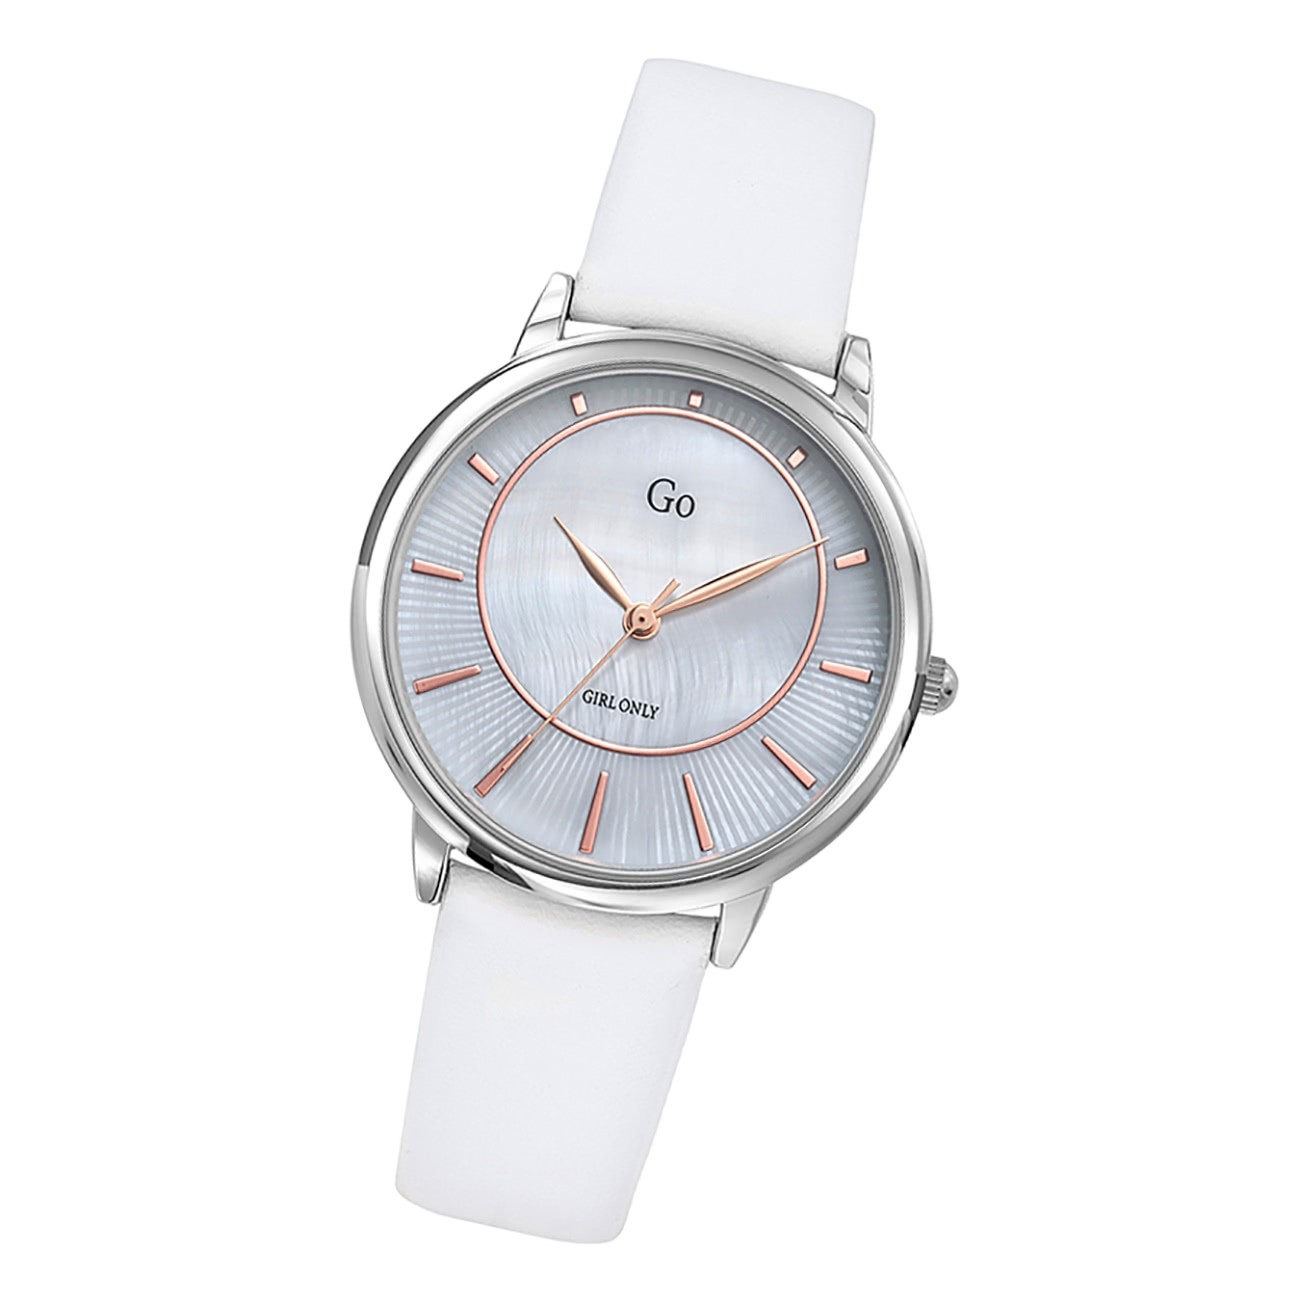 Girl Only Damen Armbanduhr GO 699322 Analog Quarz Uhr Leder weiß UGO699322